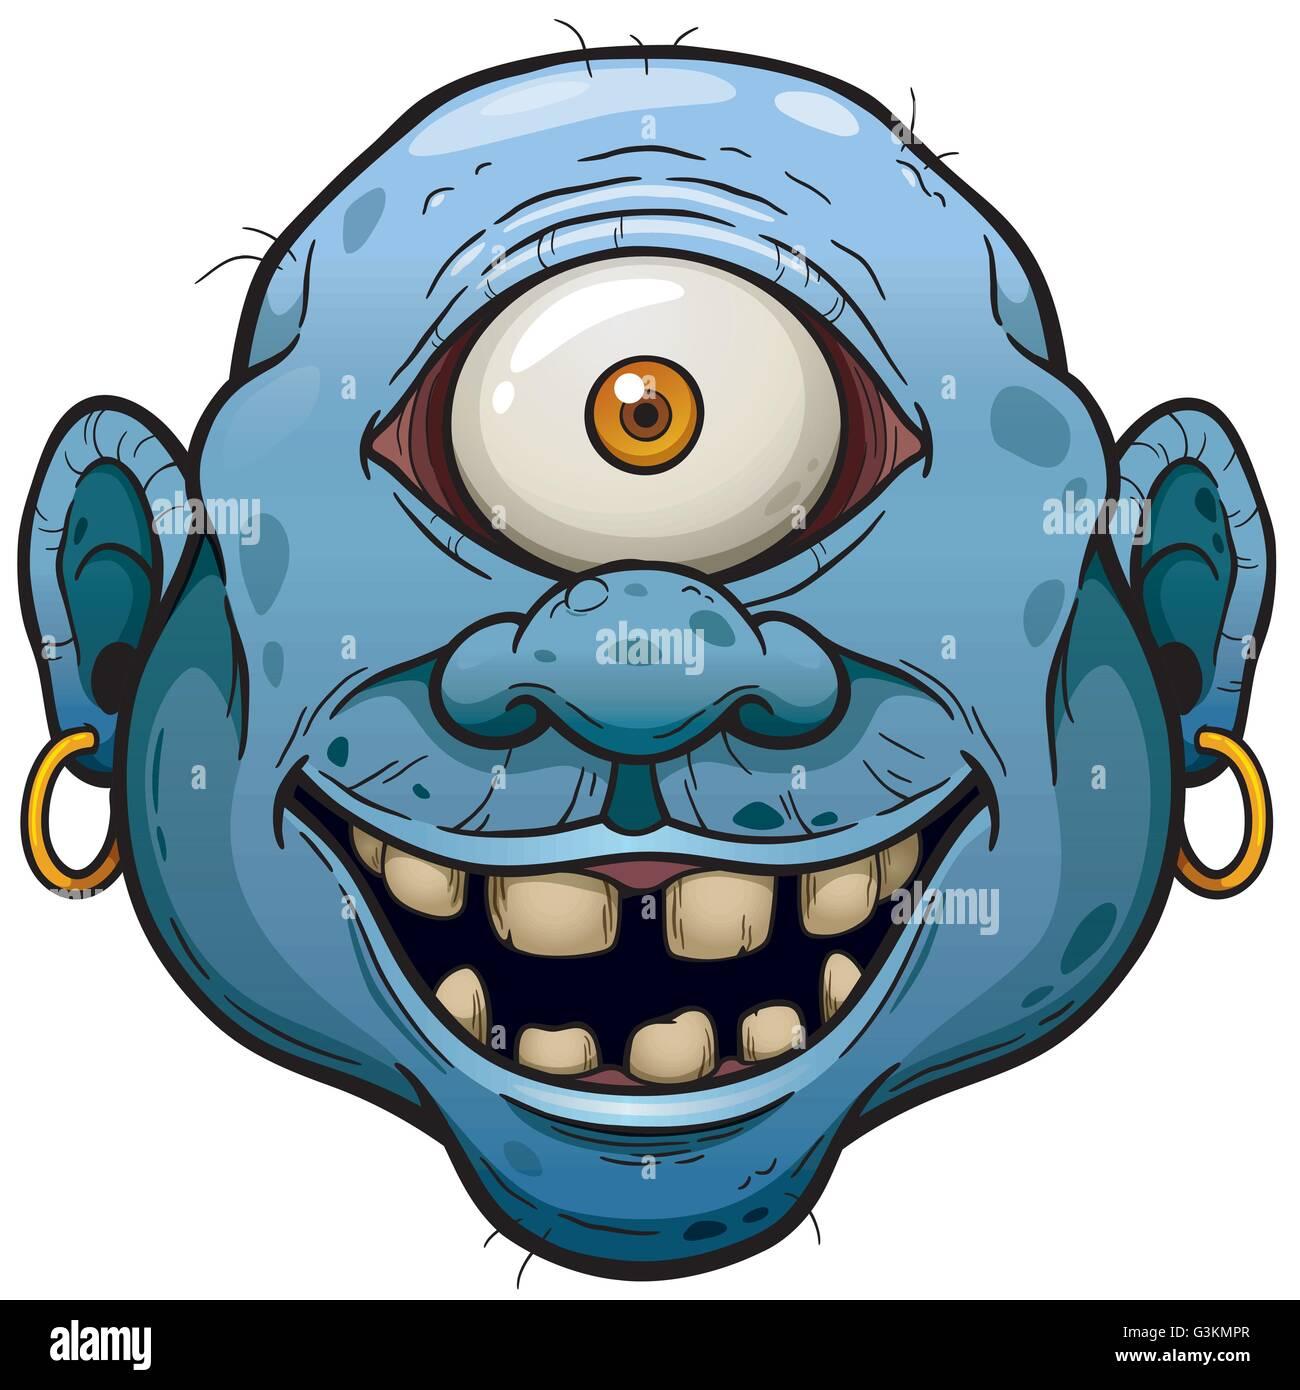 cartoon monster face stock photos cartoon monster face stock